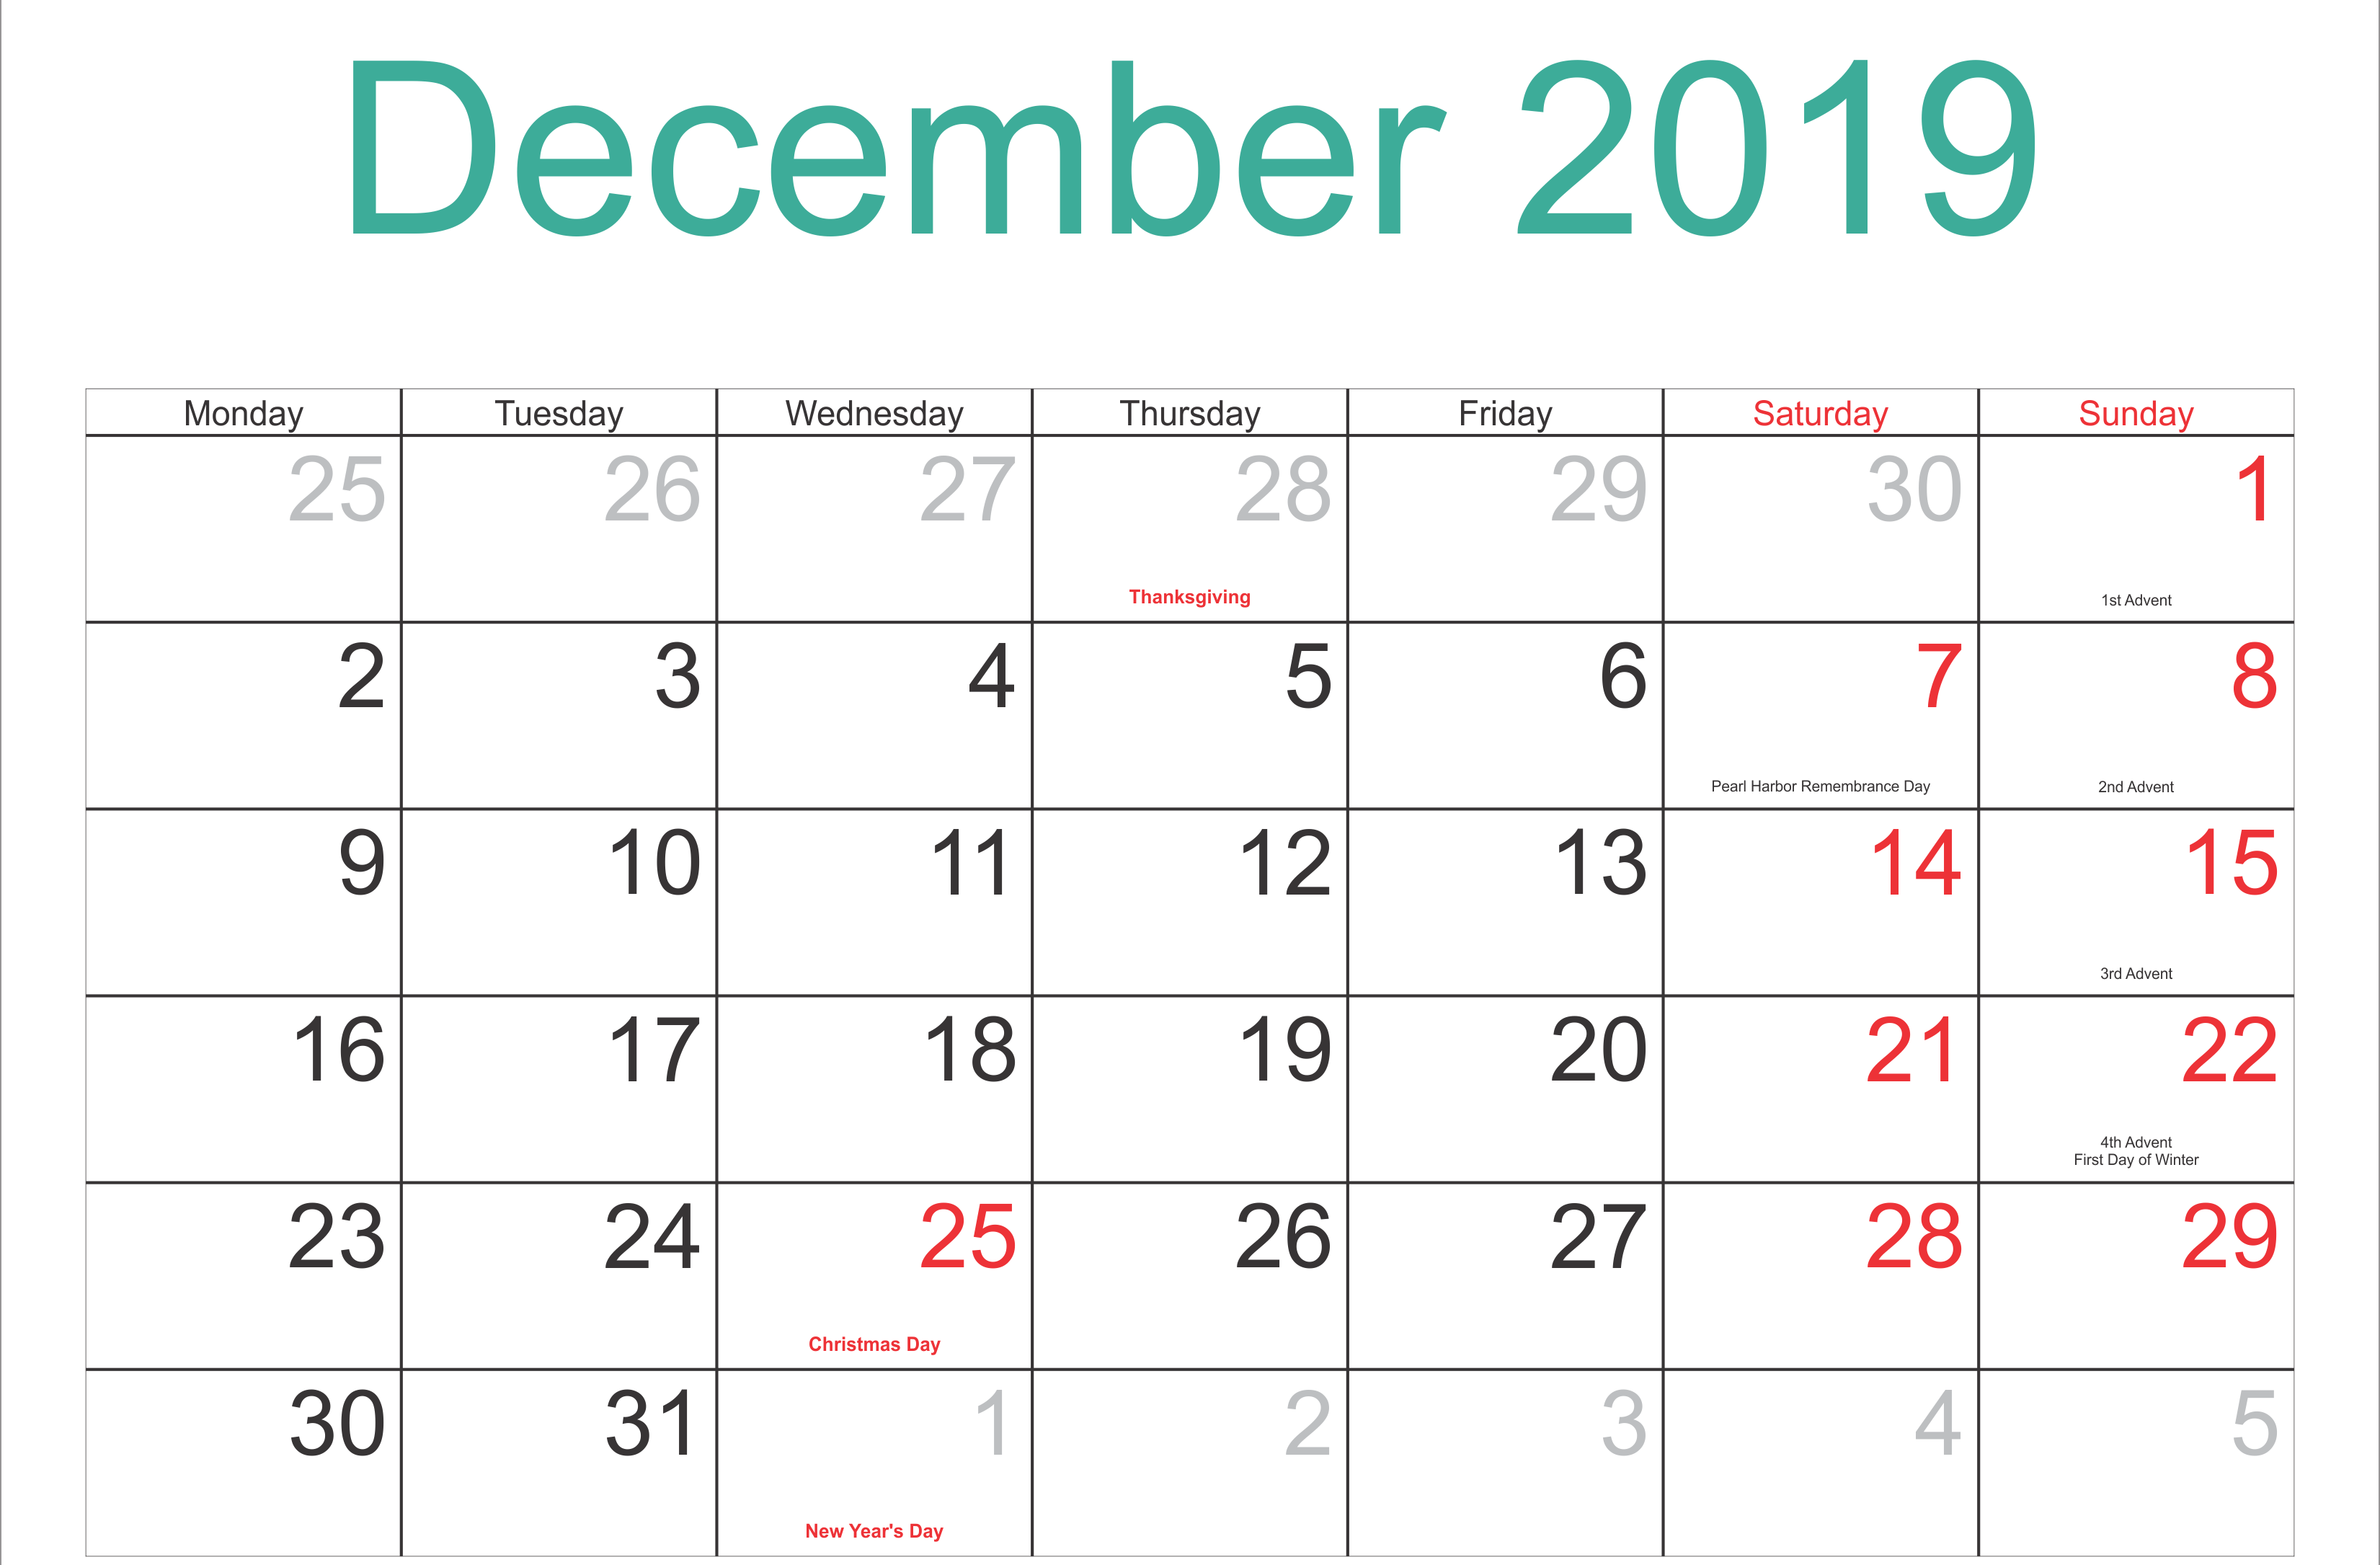 Free December 2019 Calendar With Holidays Printable Template